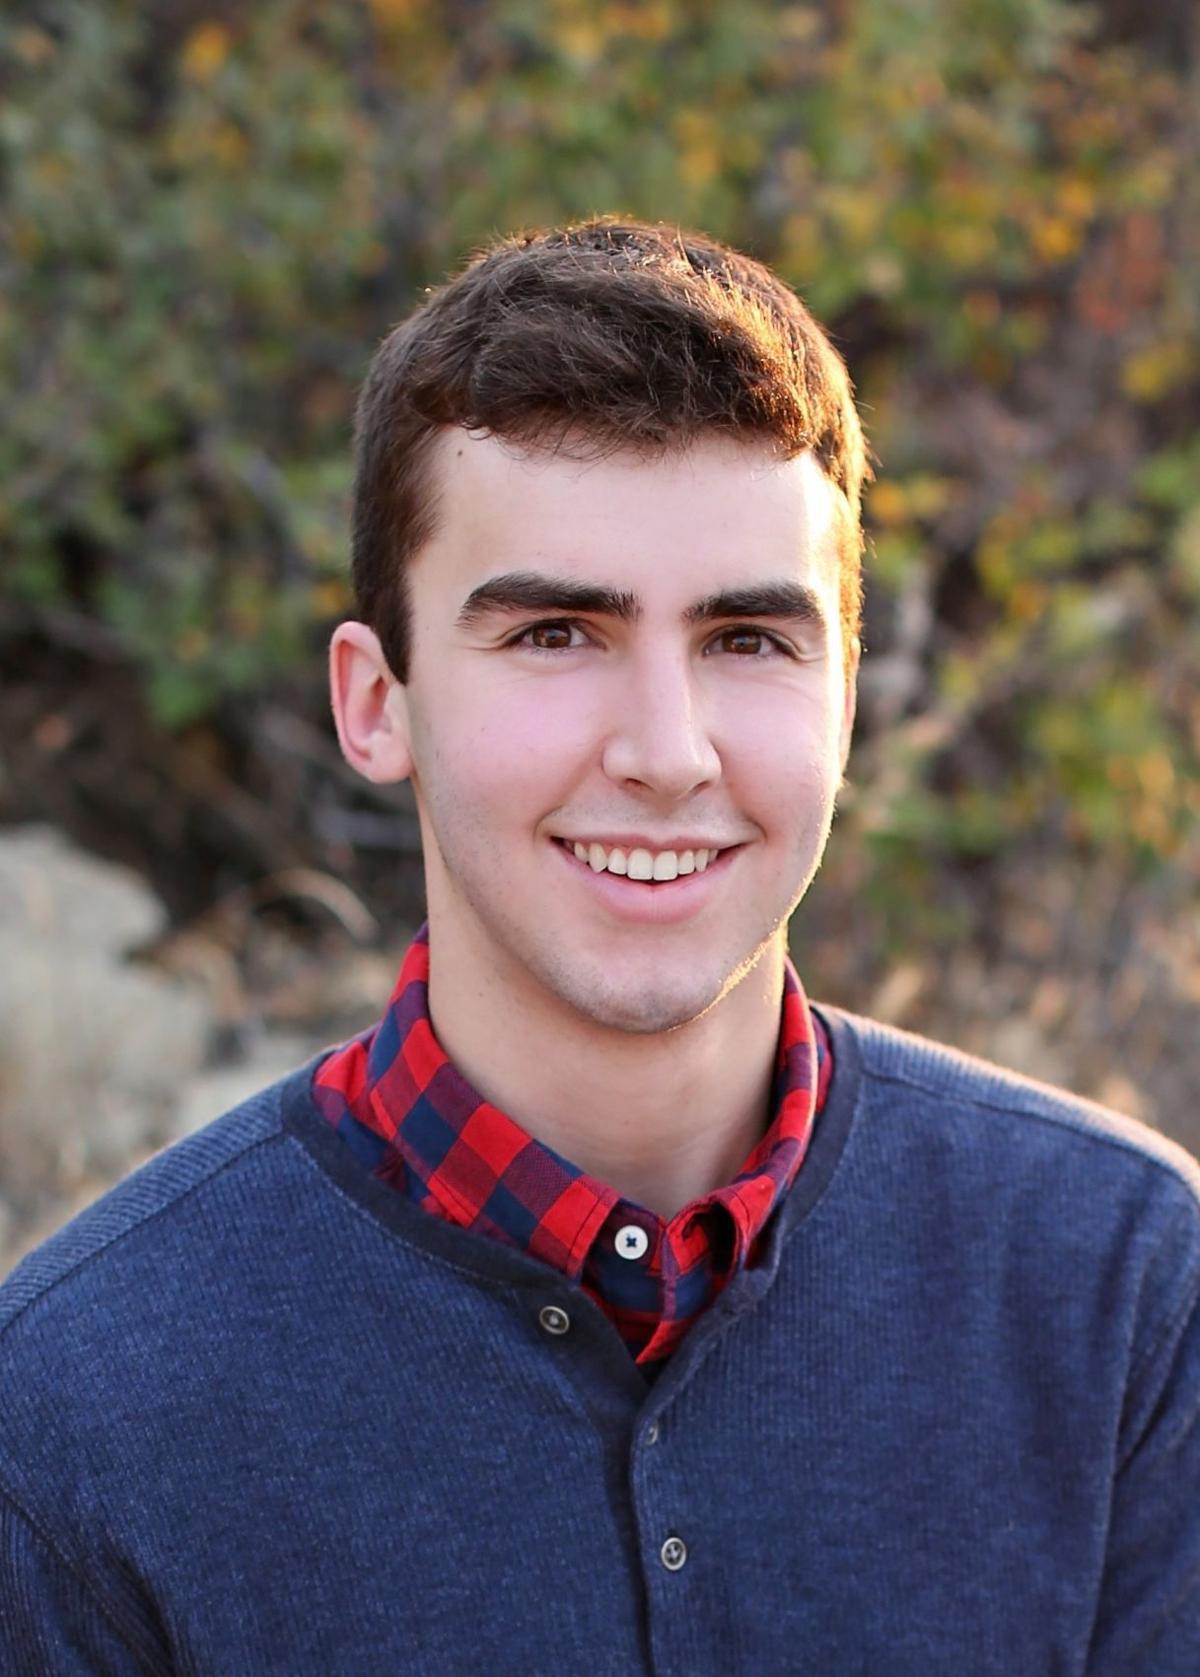 Billings West High School — Trevor Canty